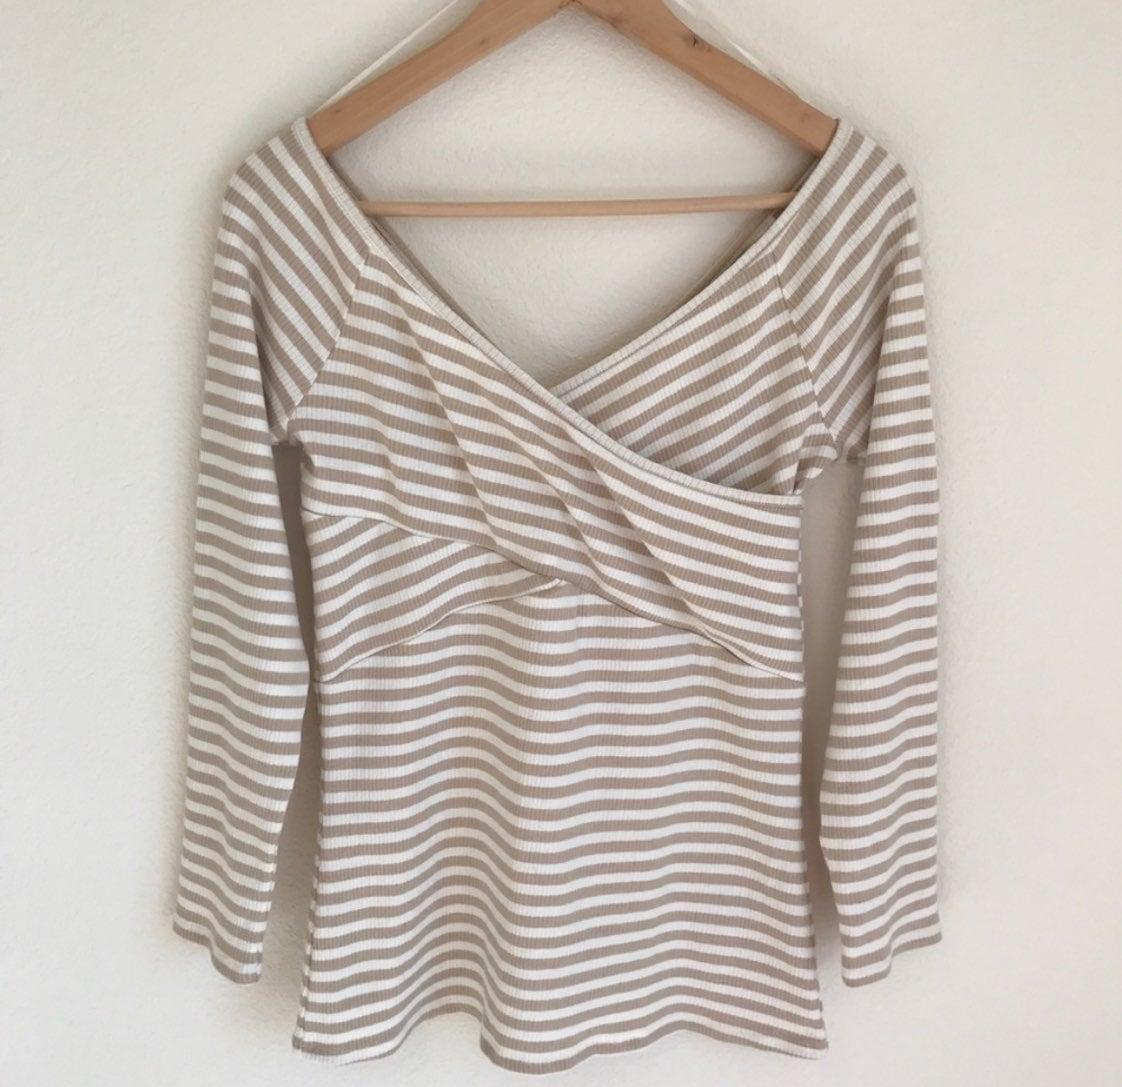 Deletta women's tan striped shirt